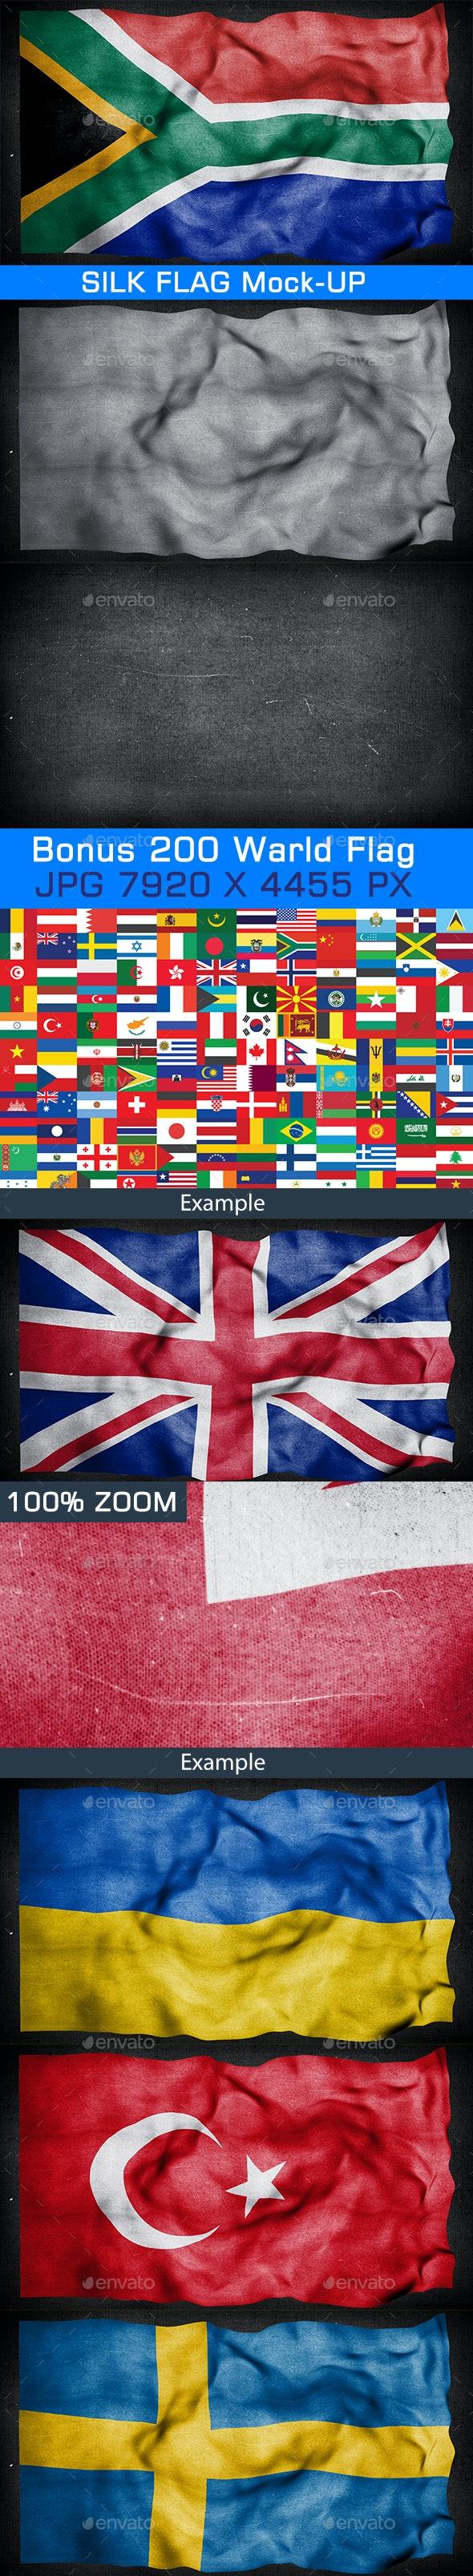 Silk Flag Mock-Up - Product Mock-Ups Graphics